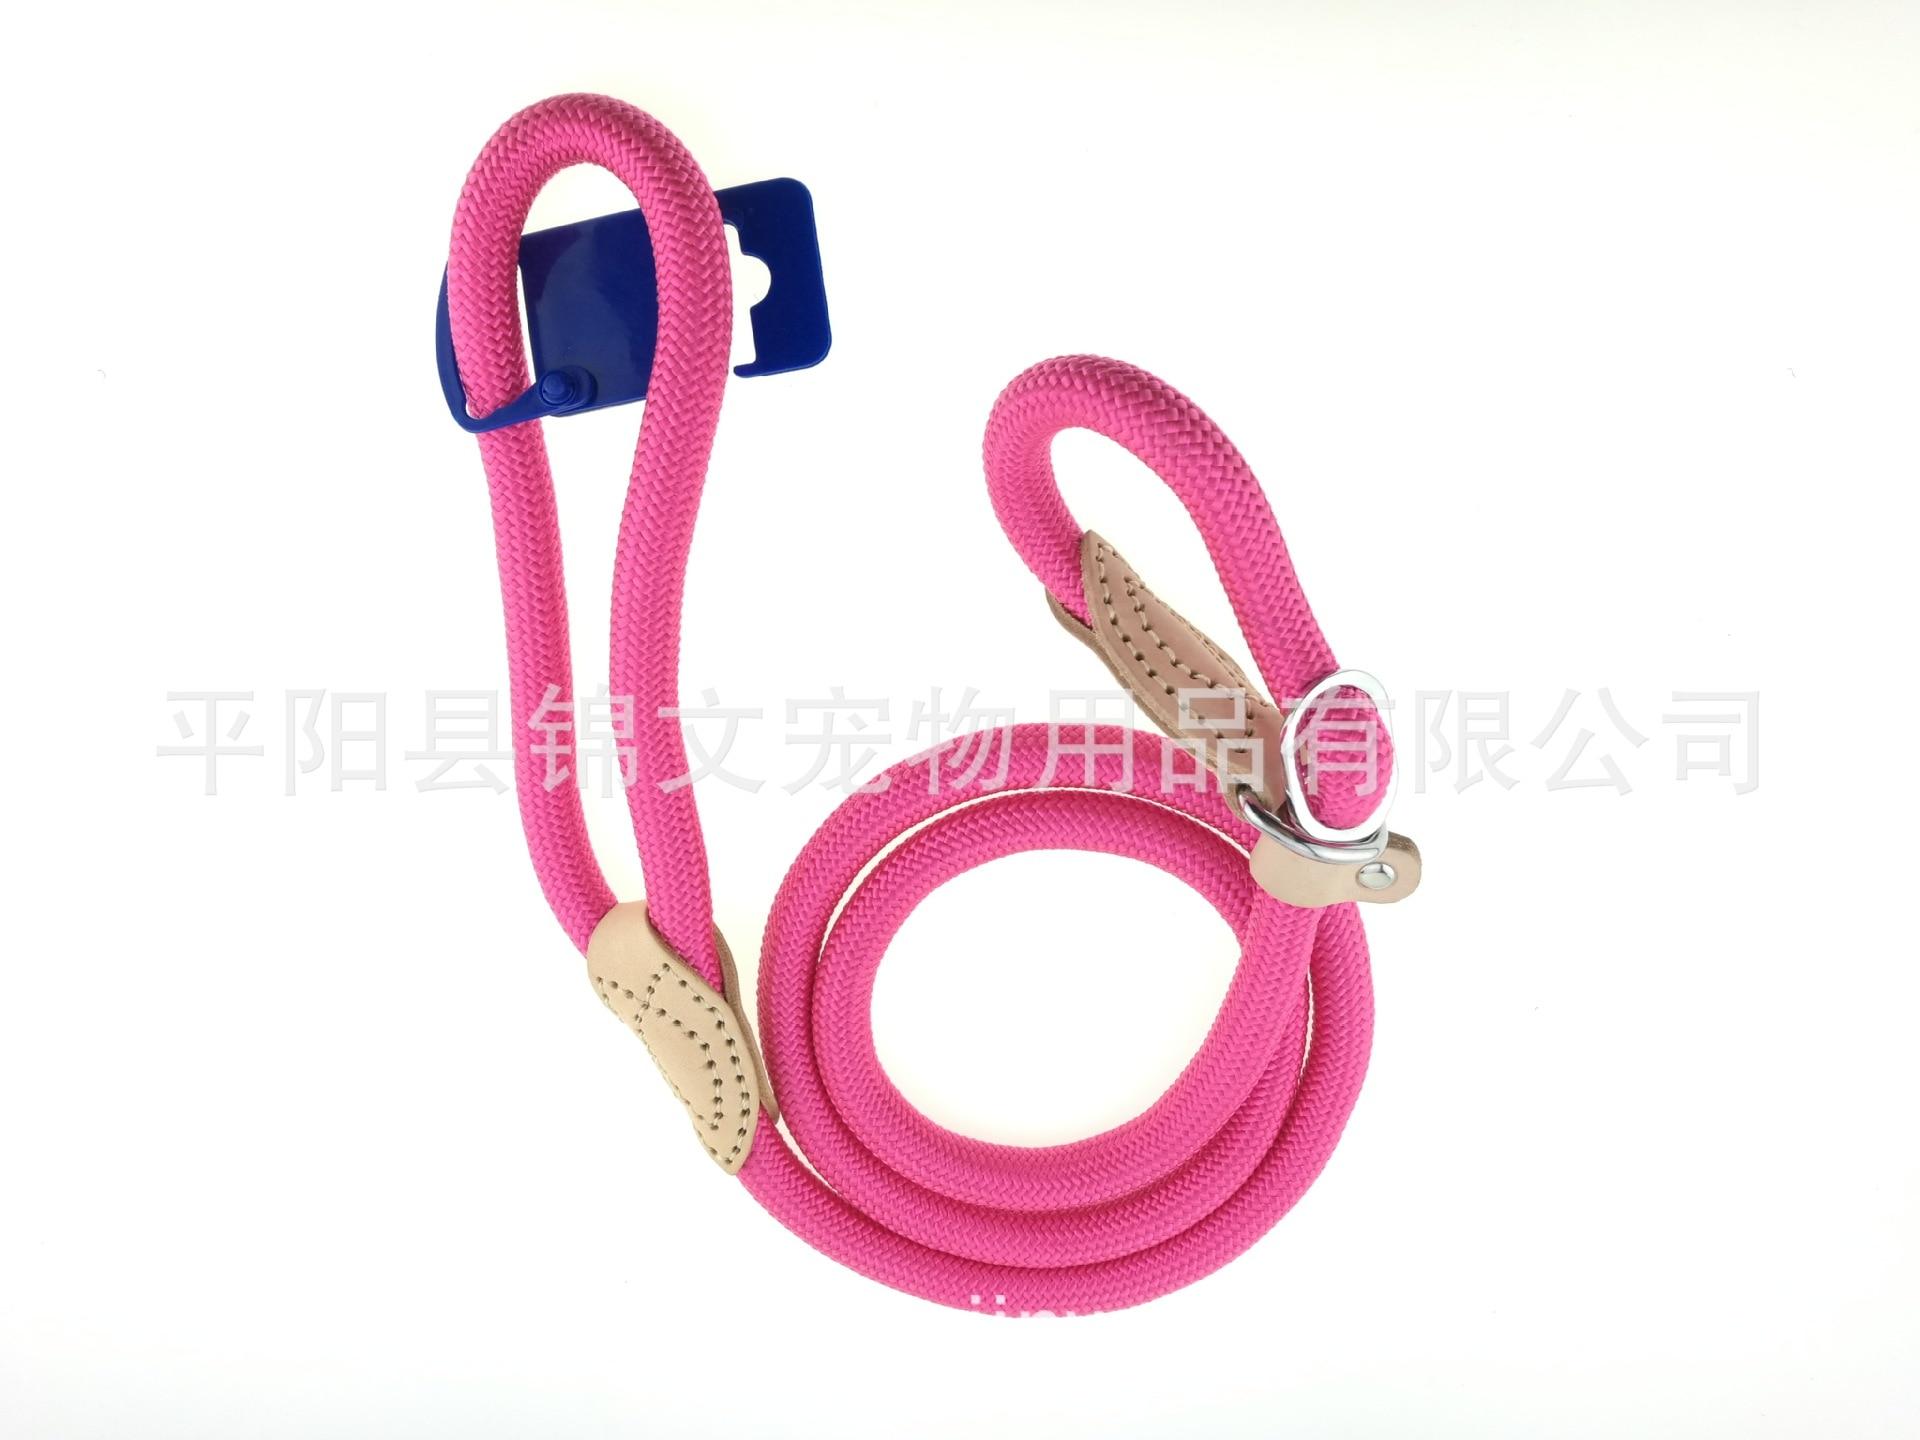 Pet Round Rope P Pendant Nylon Dog Traction Genuine Leather Sew Joint Dog Training Pendant Sub-Pet Supplies